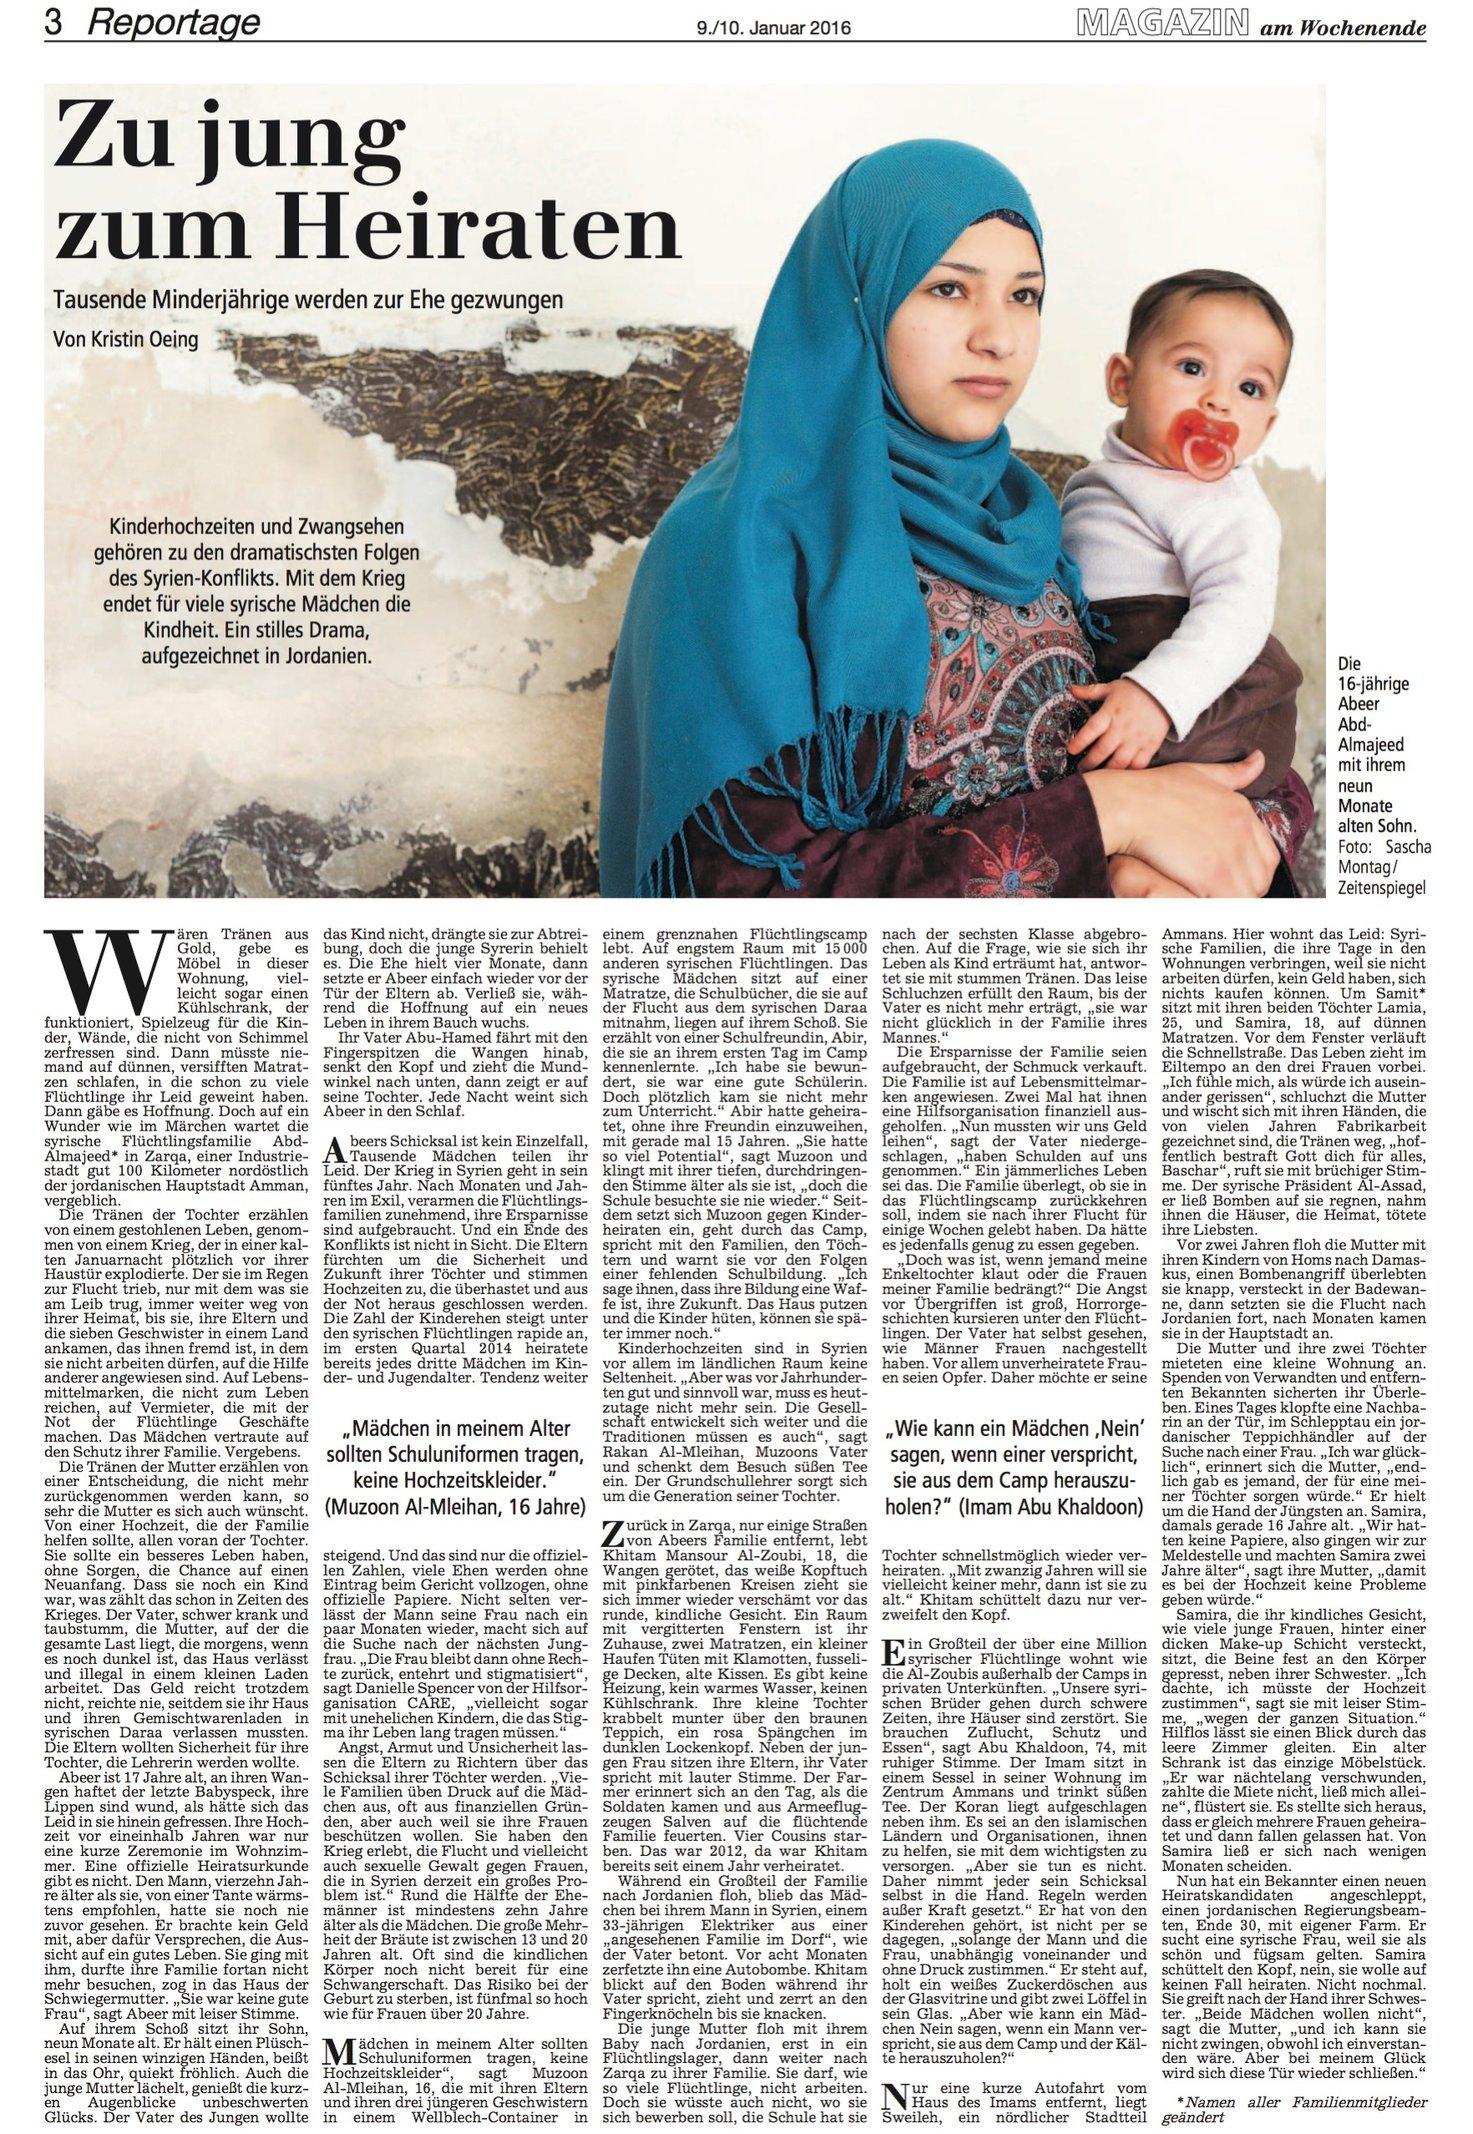 Nürnberger Nachrichten 10.2016